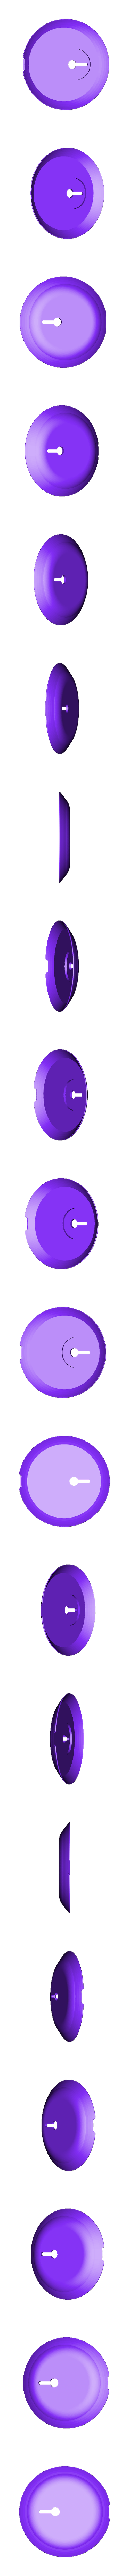 Mini_base.stl Télécharger fichier STL gratuit Mini support mural invisible Google Home Mini Invisible • Plan pour impression 3D, iamjorgensen